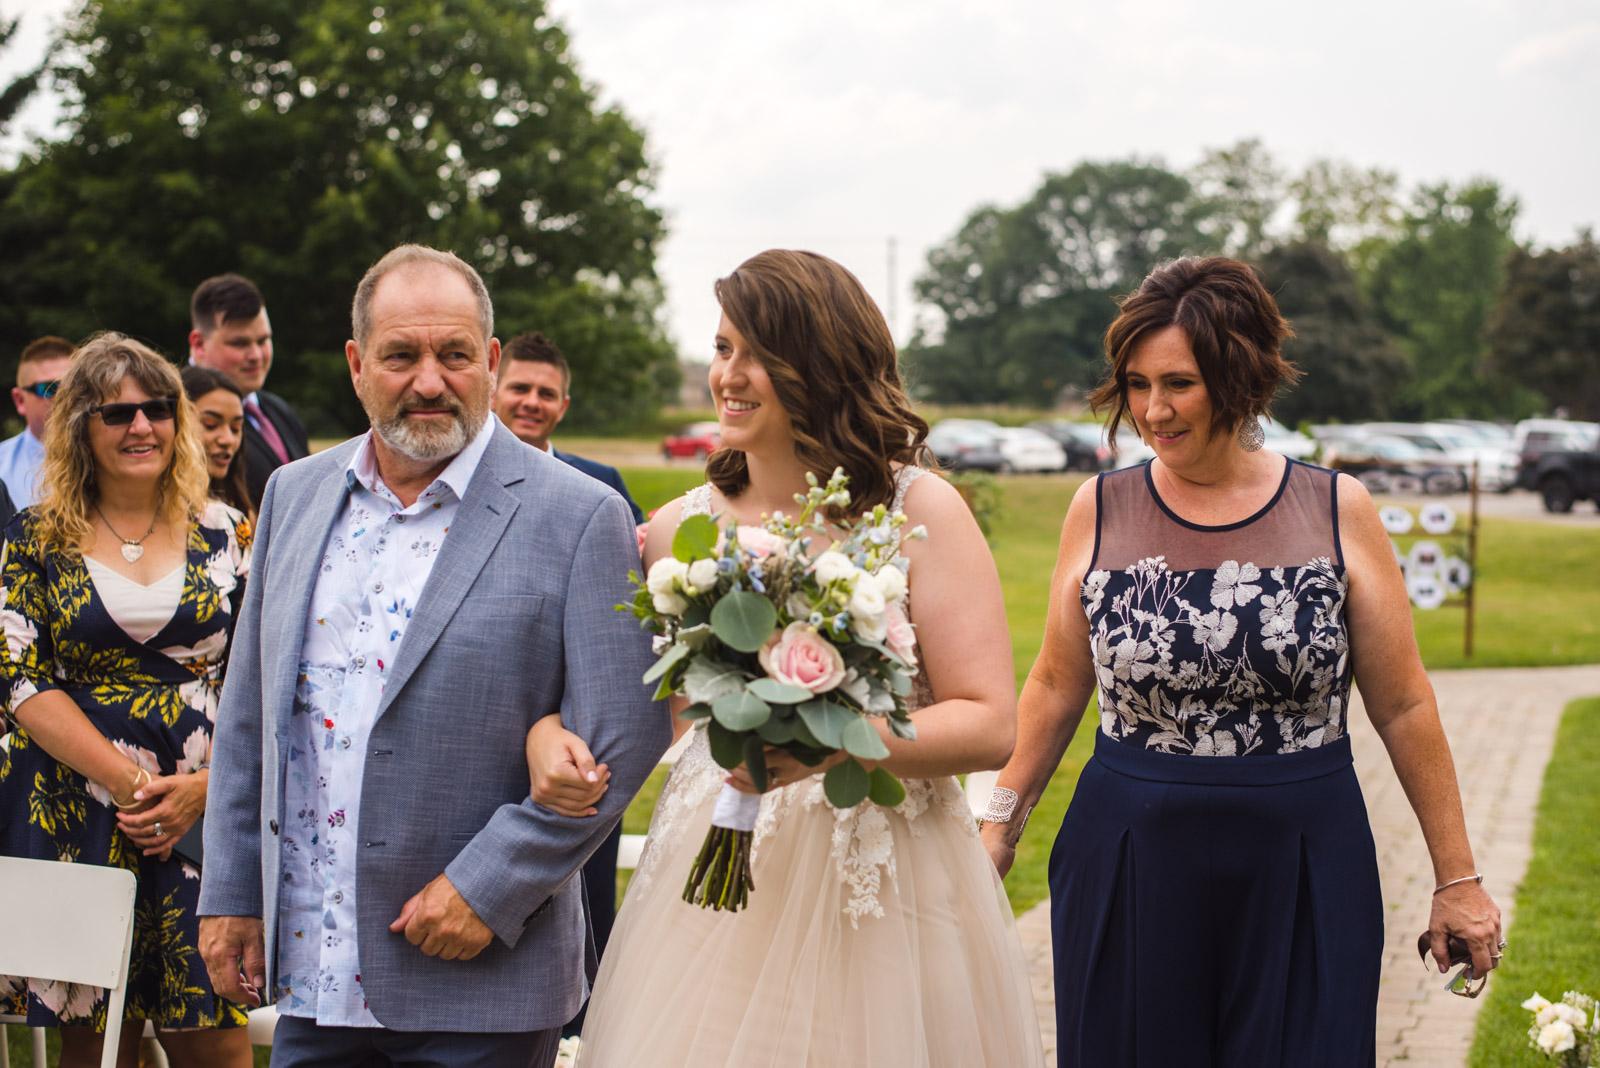 Emerson & Elicia's Golf Course Wedding Aidan & Leanne Hennebry Hamilton Wedding Videographers Photographers Niagara Hush Hush Photography & Film-16.jpg